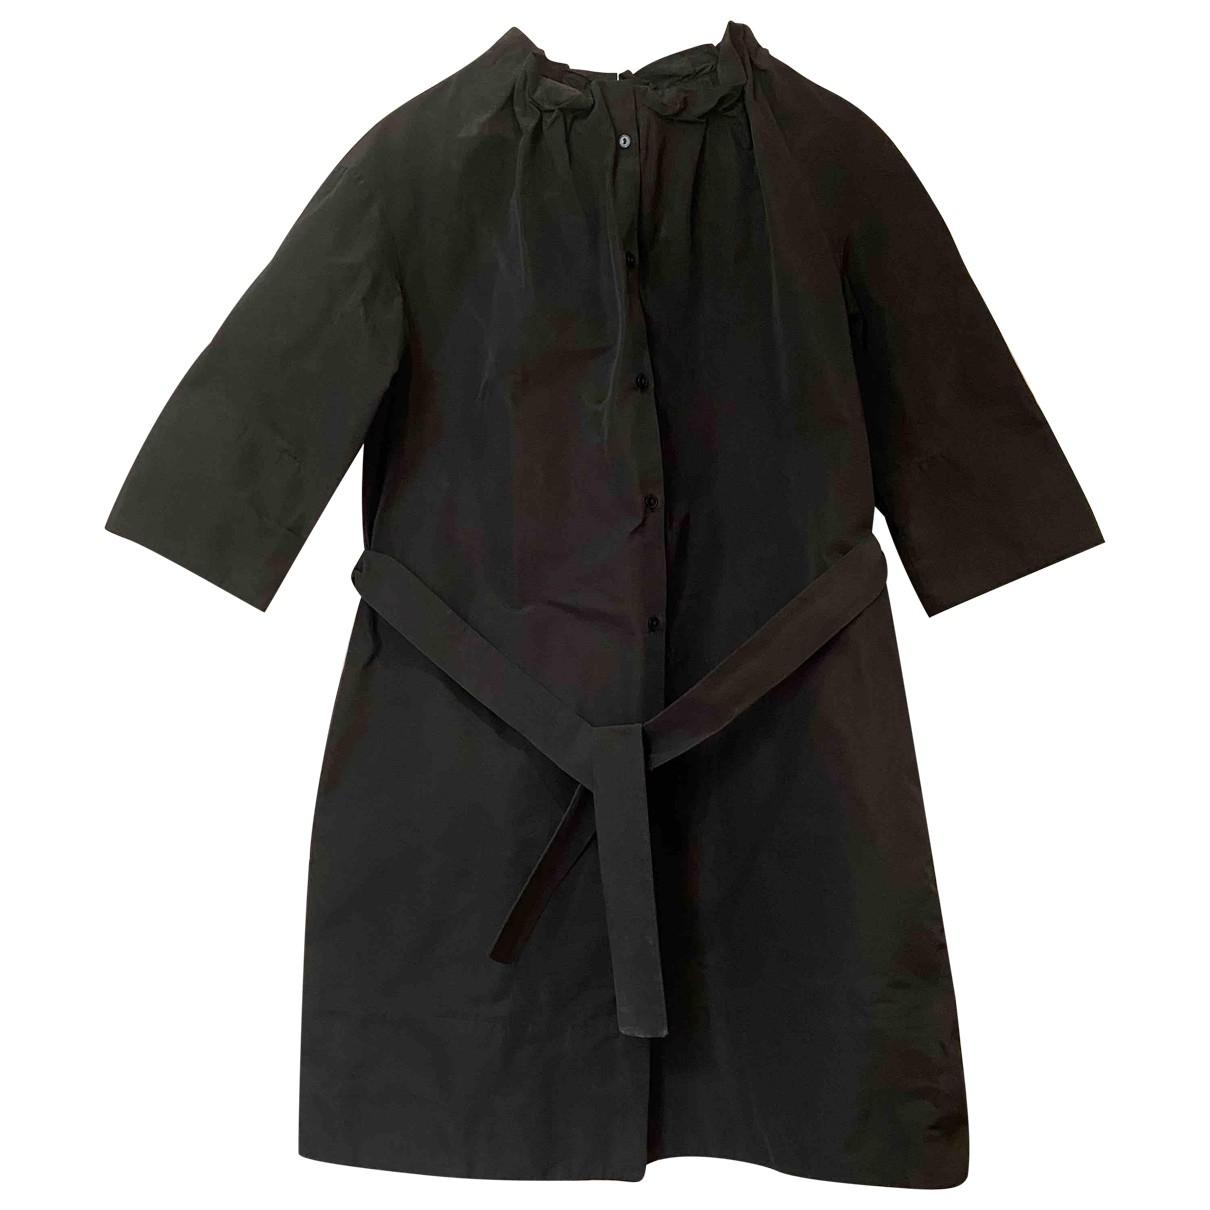 Cos \N Kleid in  Schwarz Polyester